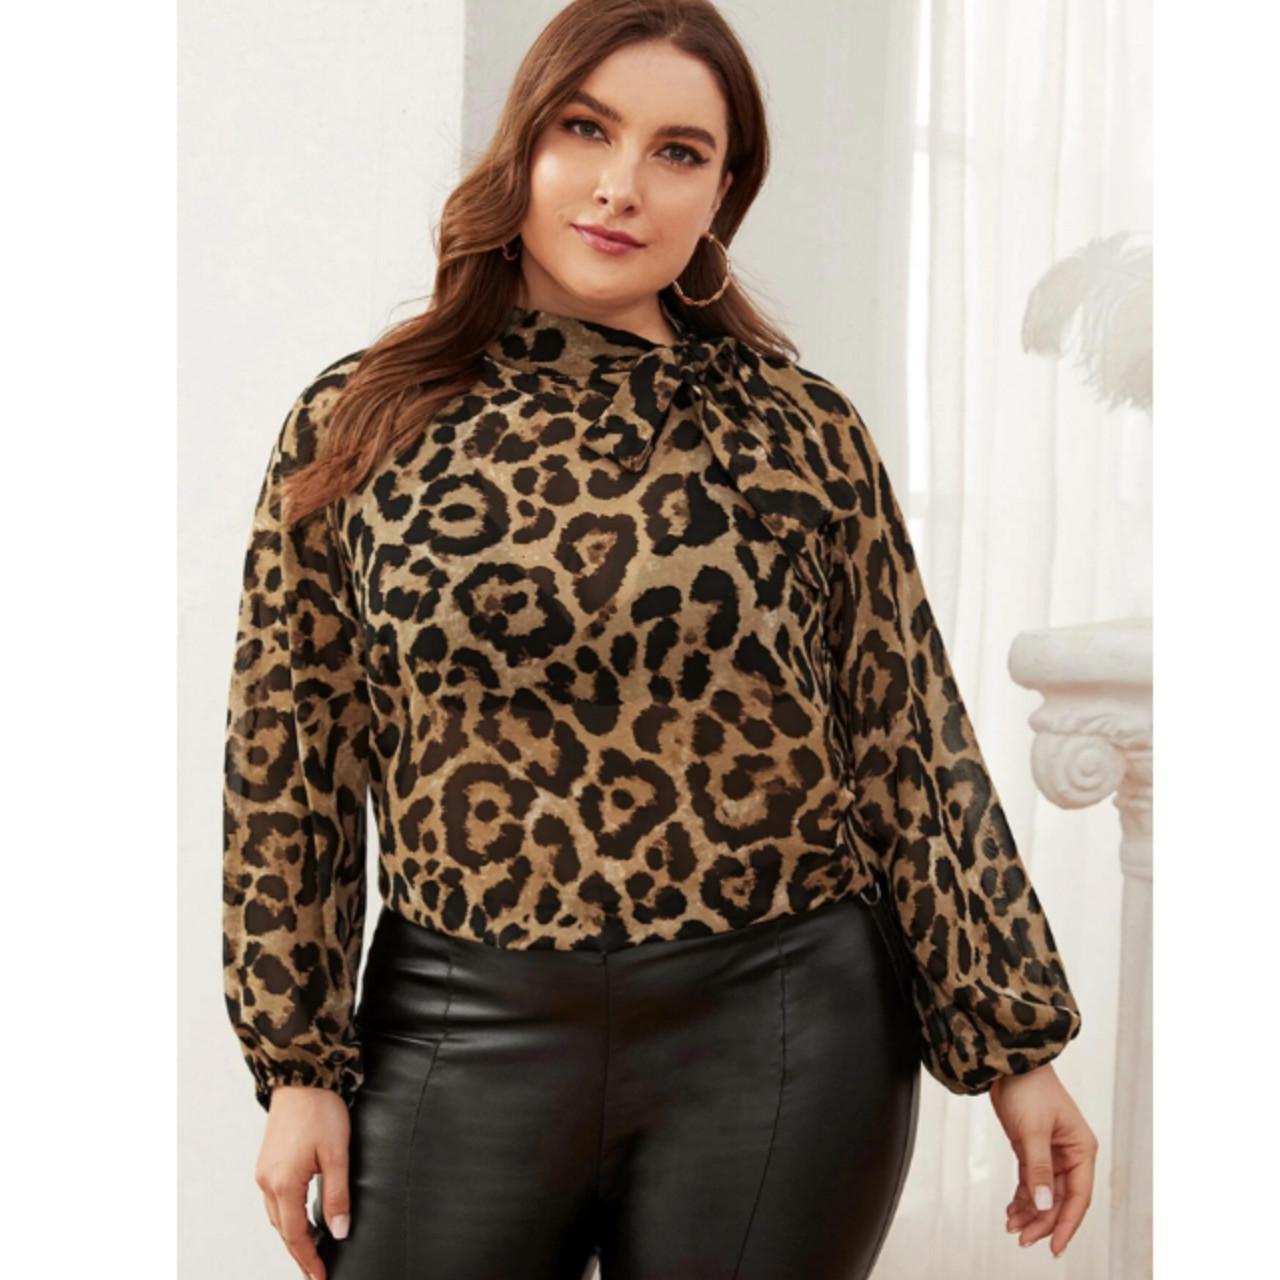 Plus tie neck lantern sleeve leopard top 0xl